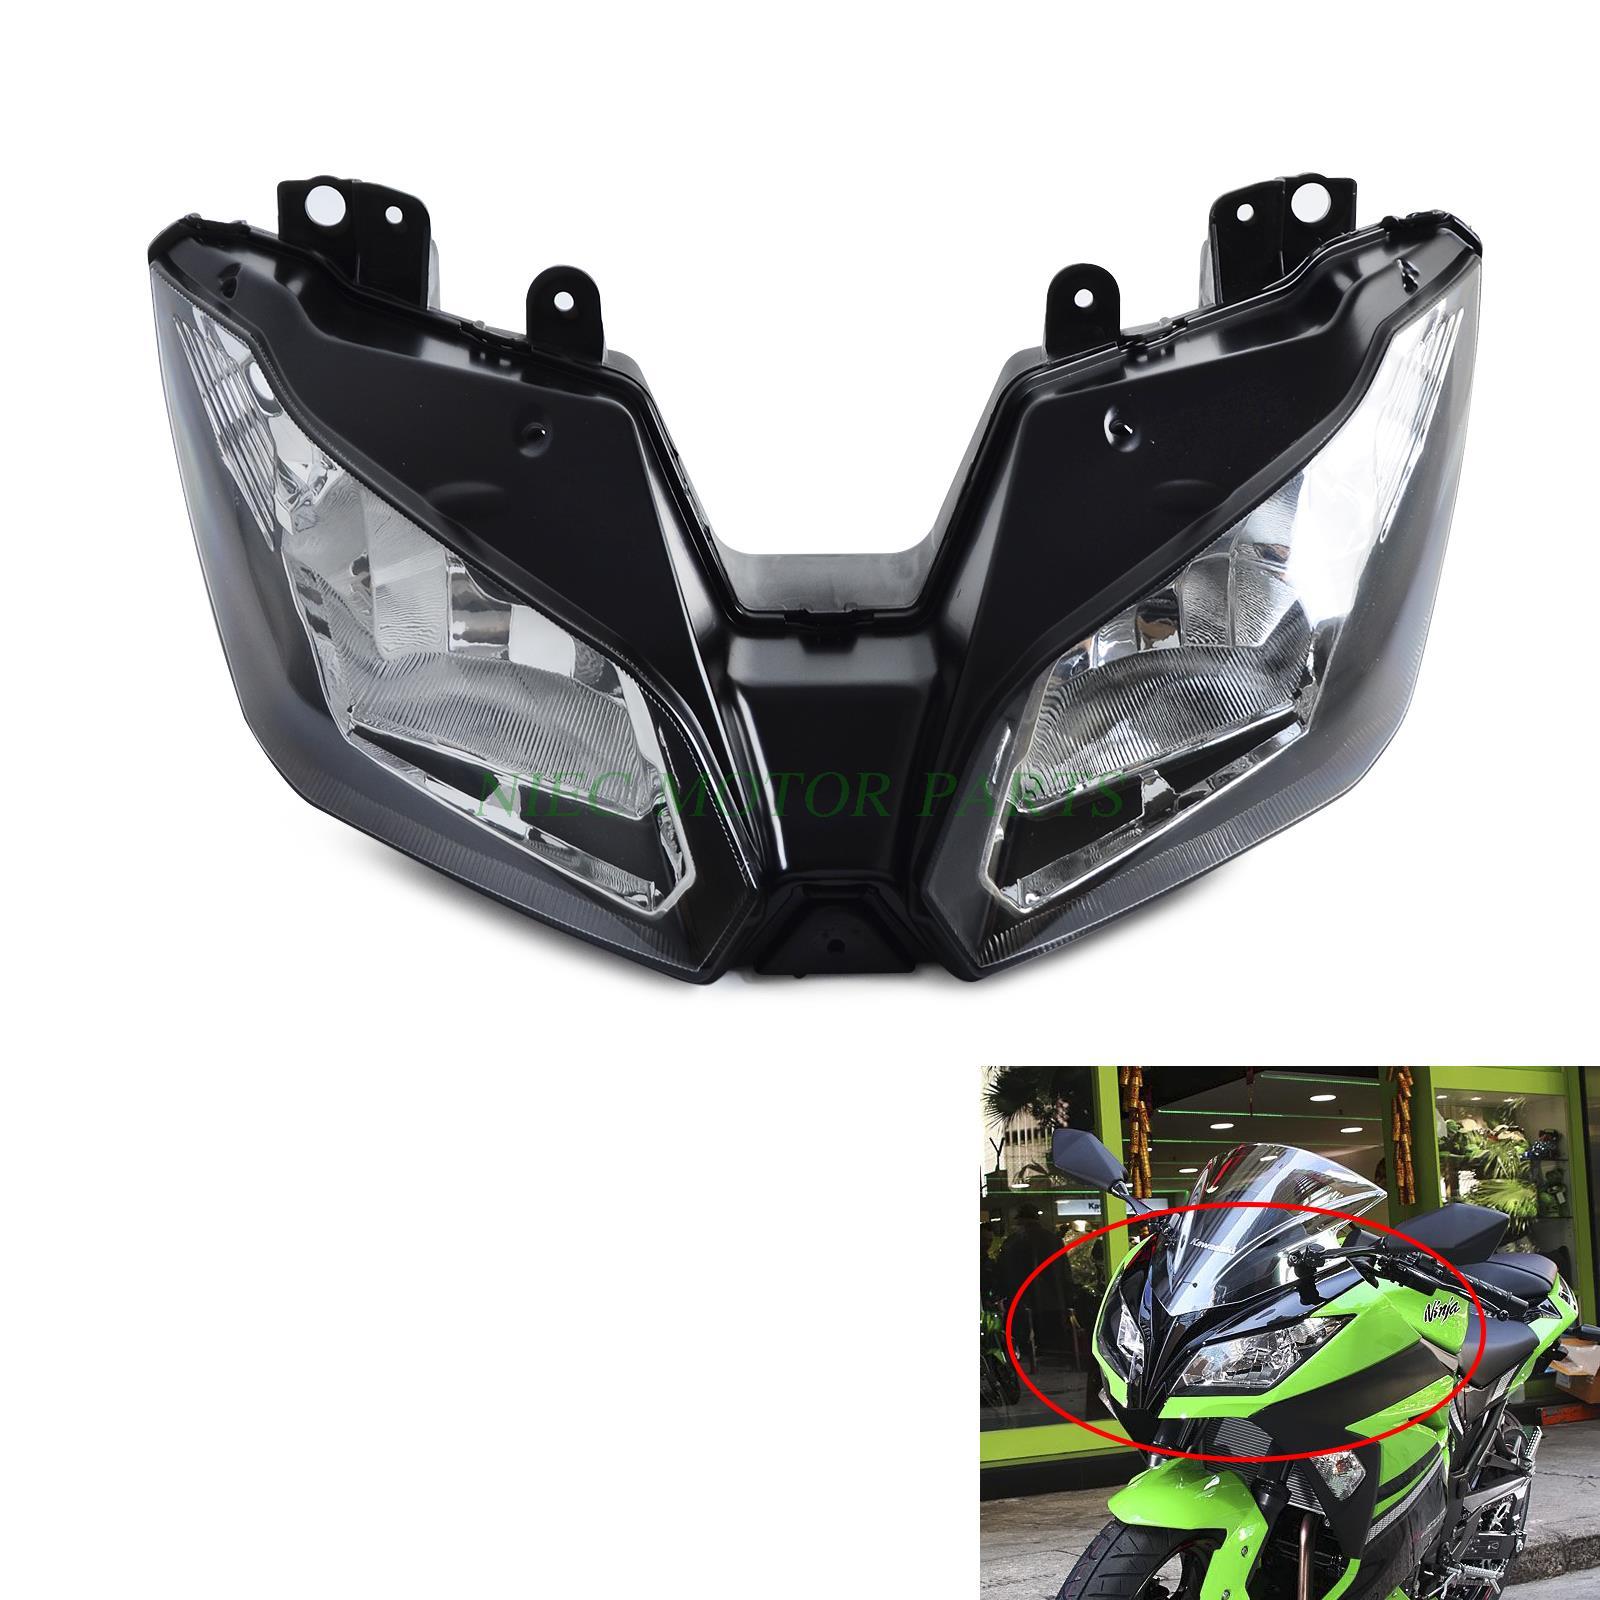 Motorcycle Headlights Headlamp Head Light Lamp Assembly For Kawasaki NINJA 300 ABS EX300 2013-2015 VERSYS 650 1000 2015 2016